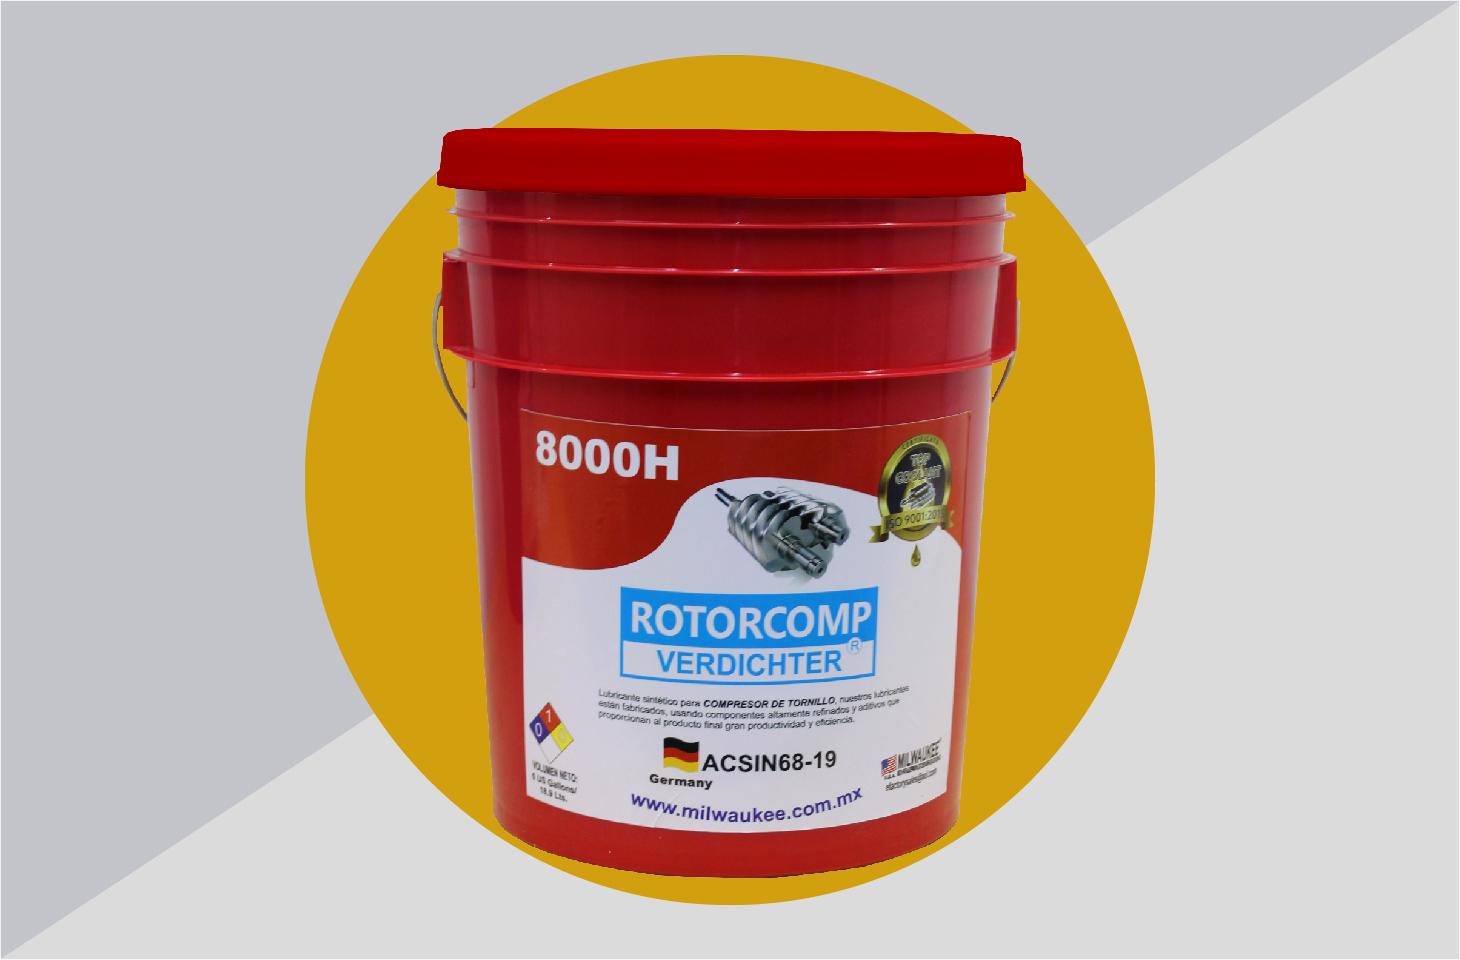 Rotorcomp Verdichter 8000H